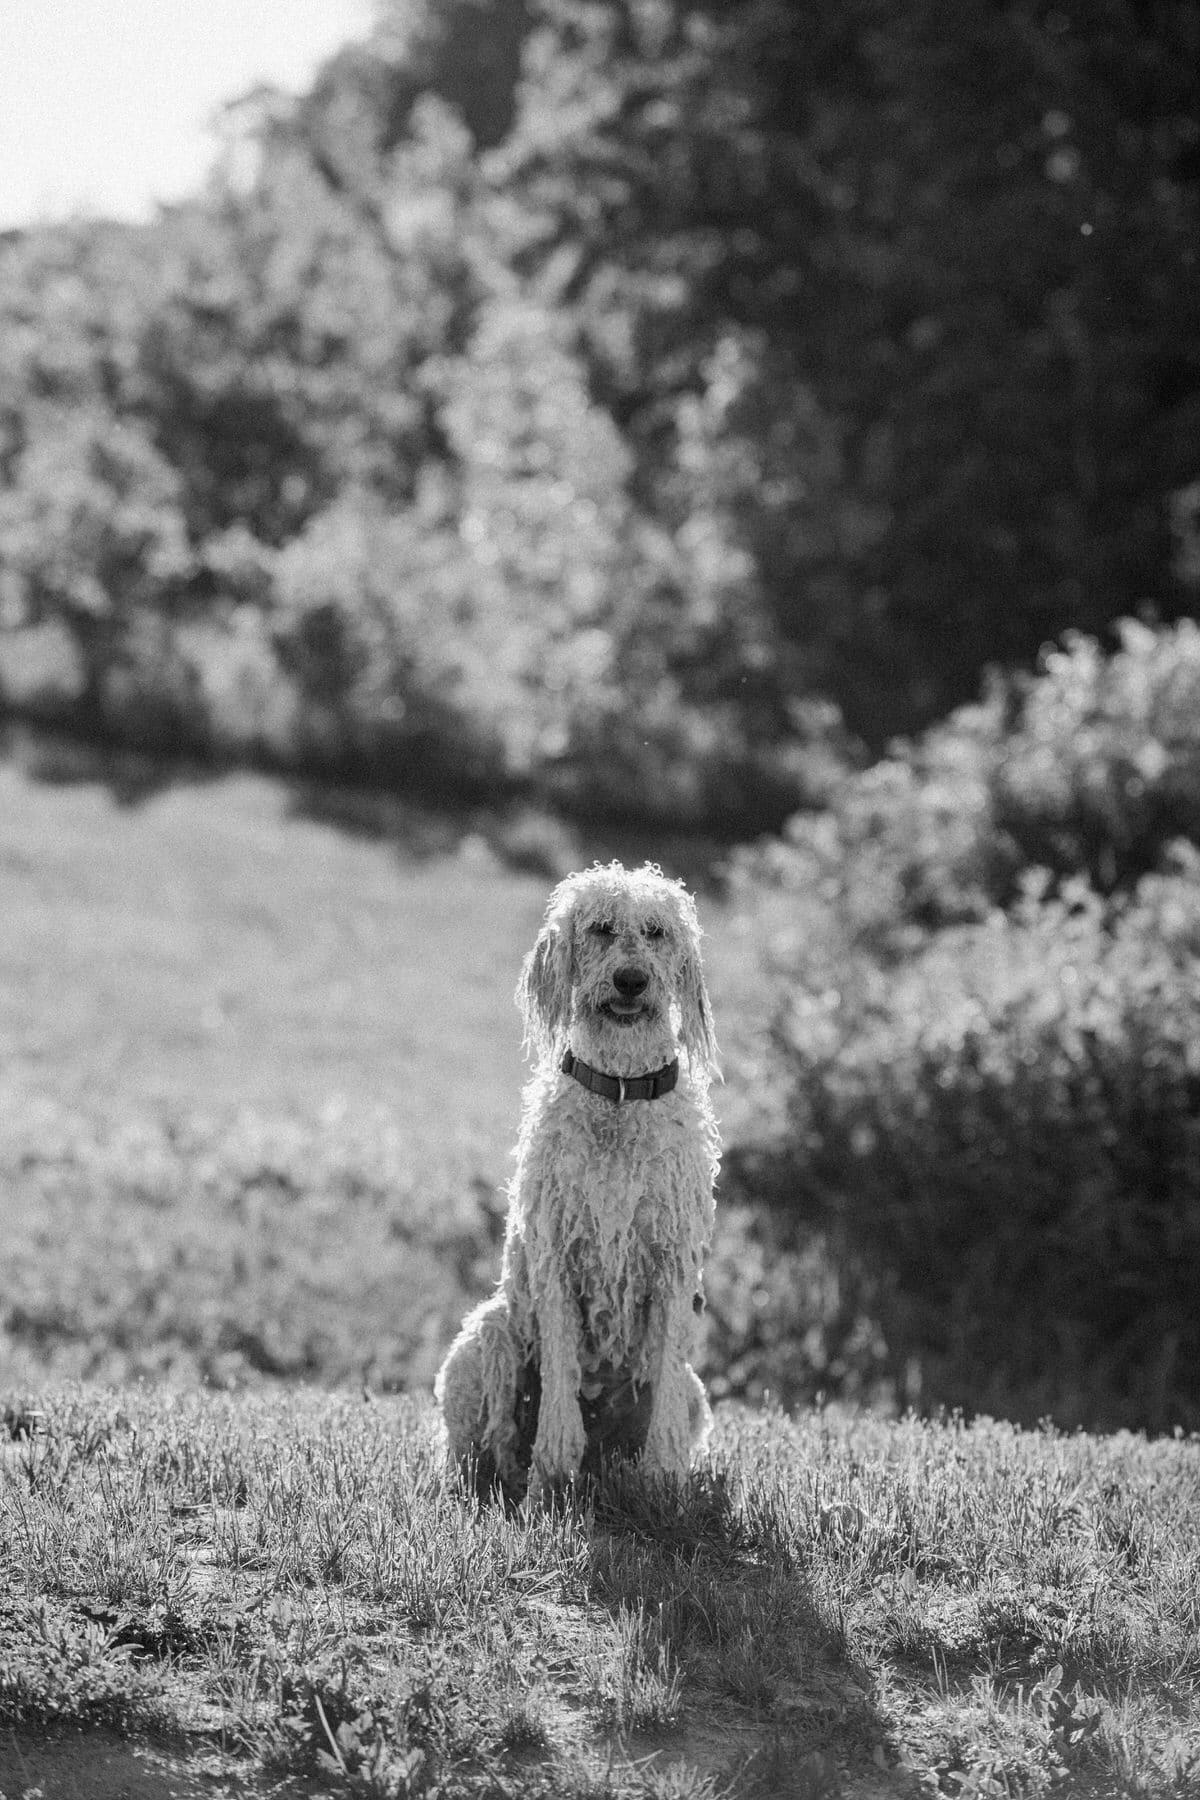 Goldendoodle-Macy-dog-fine-art-photography-by-Studio-L-photographer-Laura-Schneider-_8241